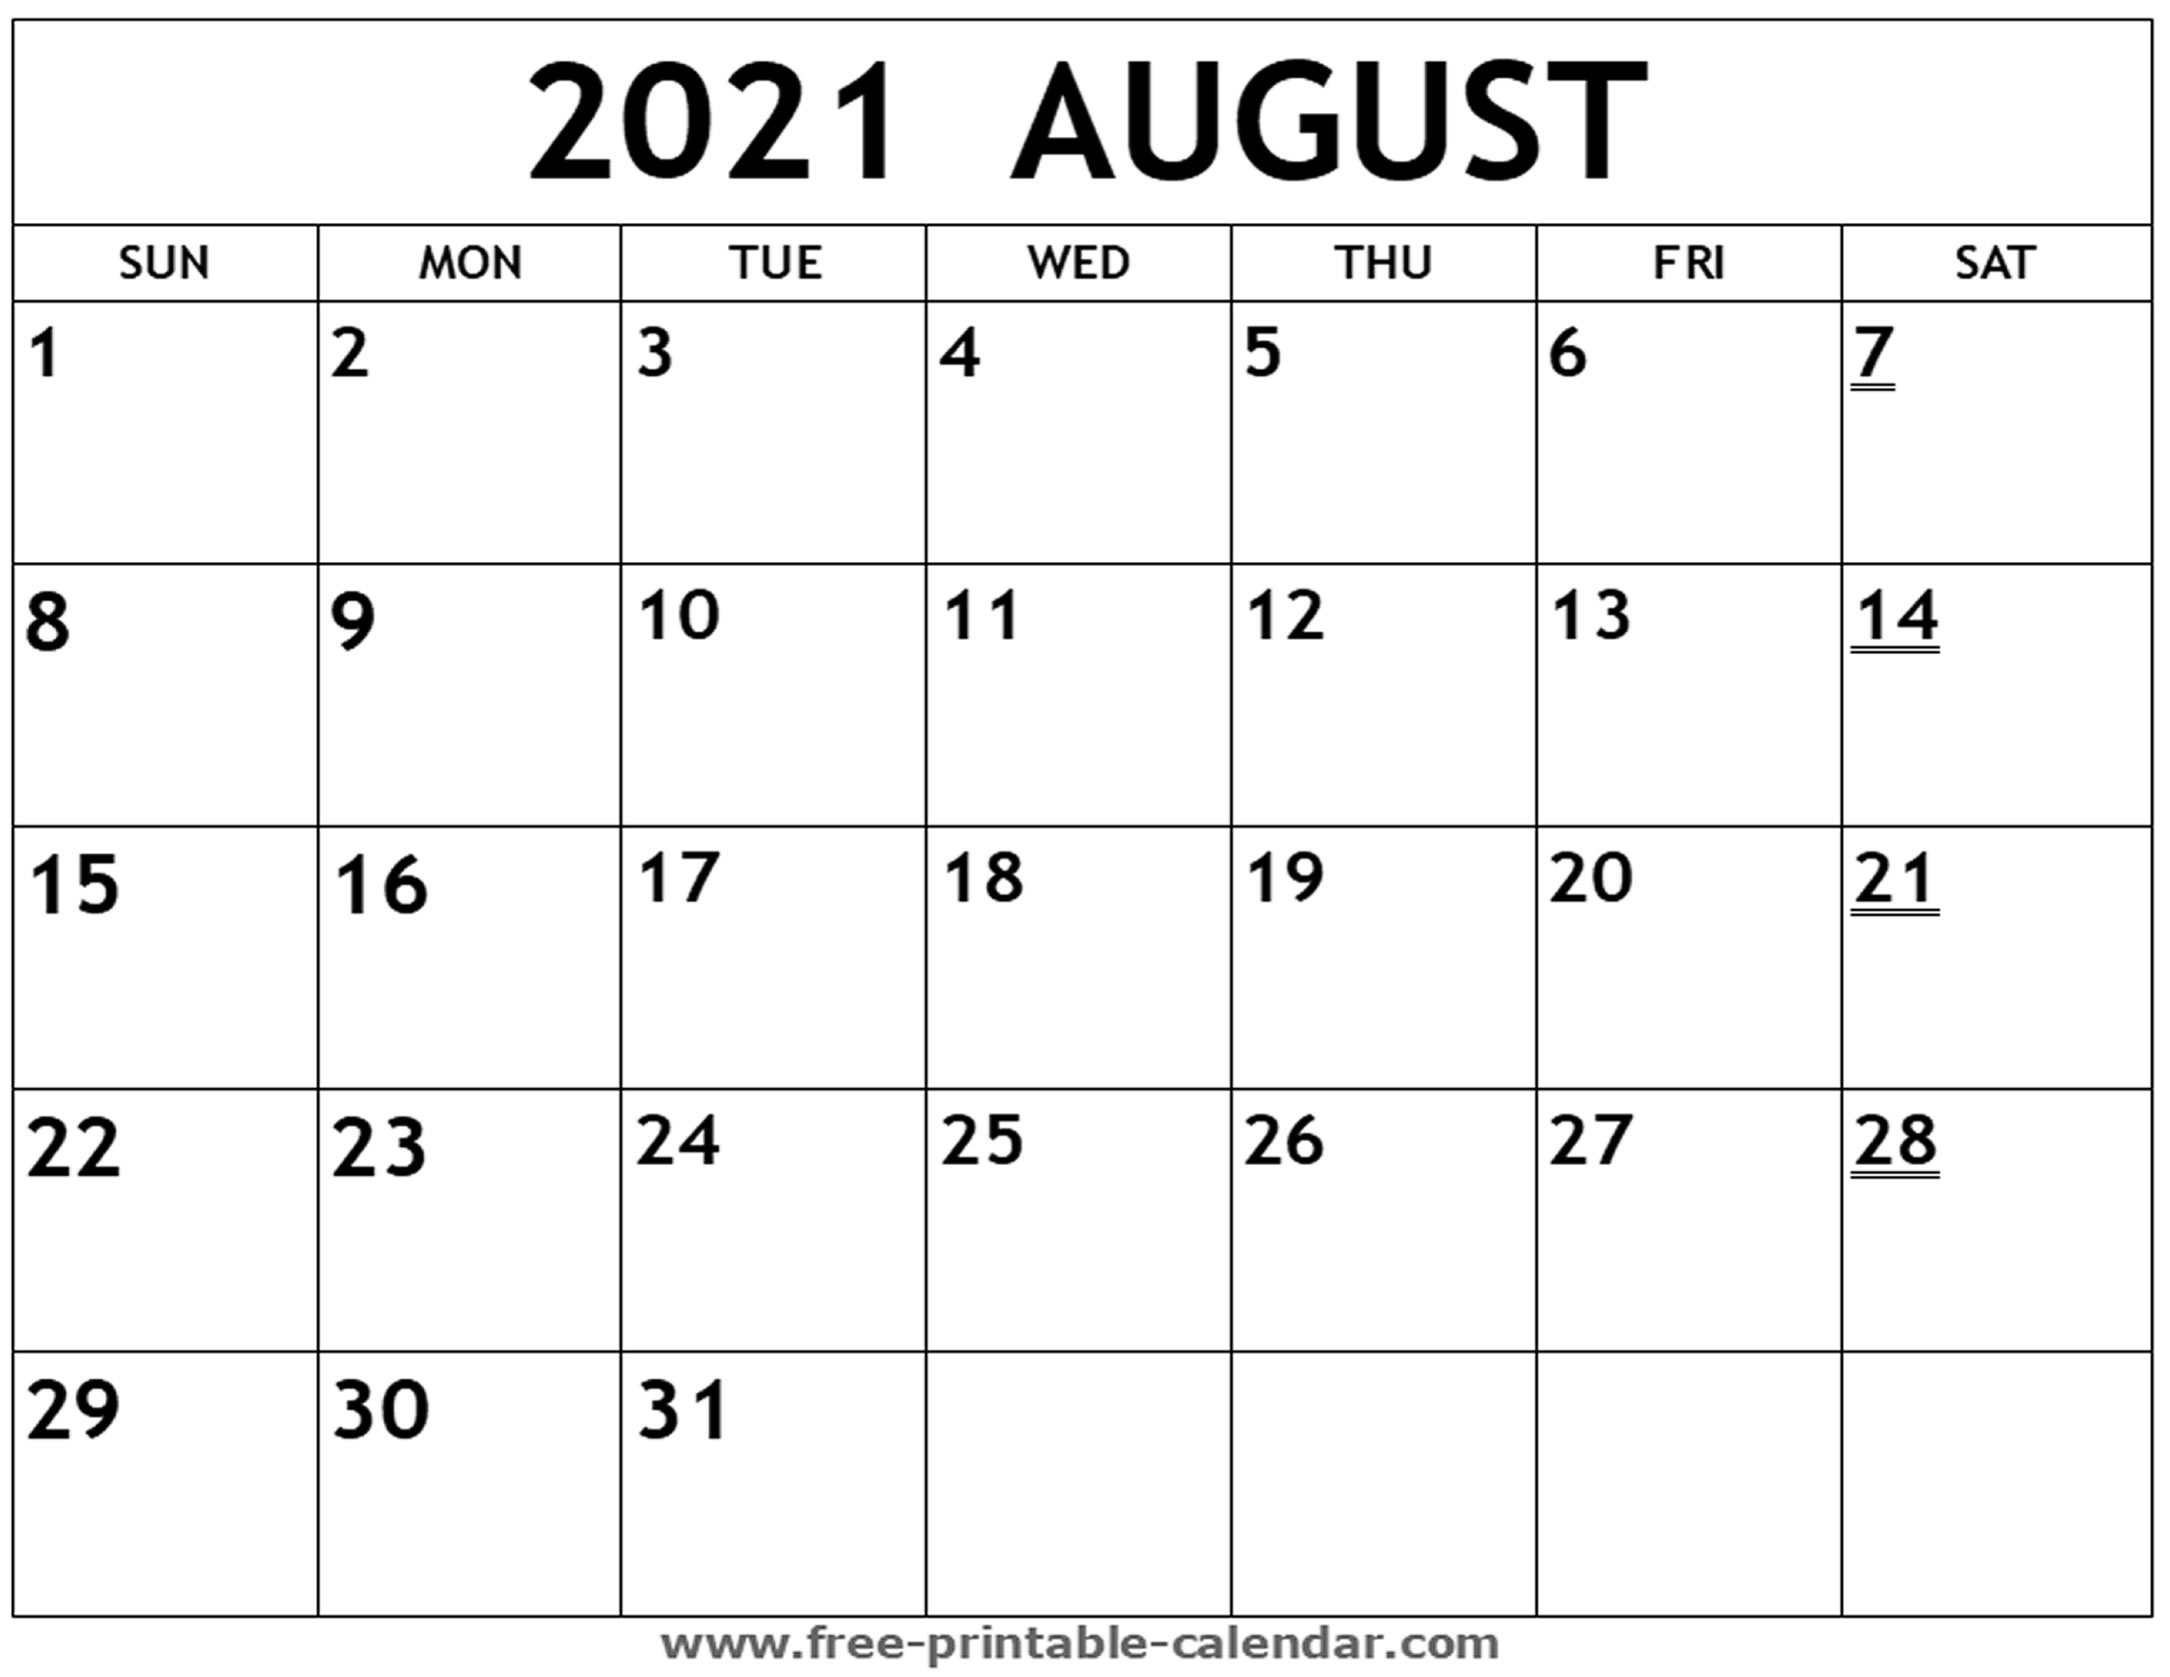 Printable 2021 August Calendar - Free-Printable-Calendar